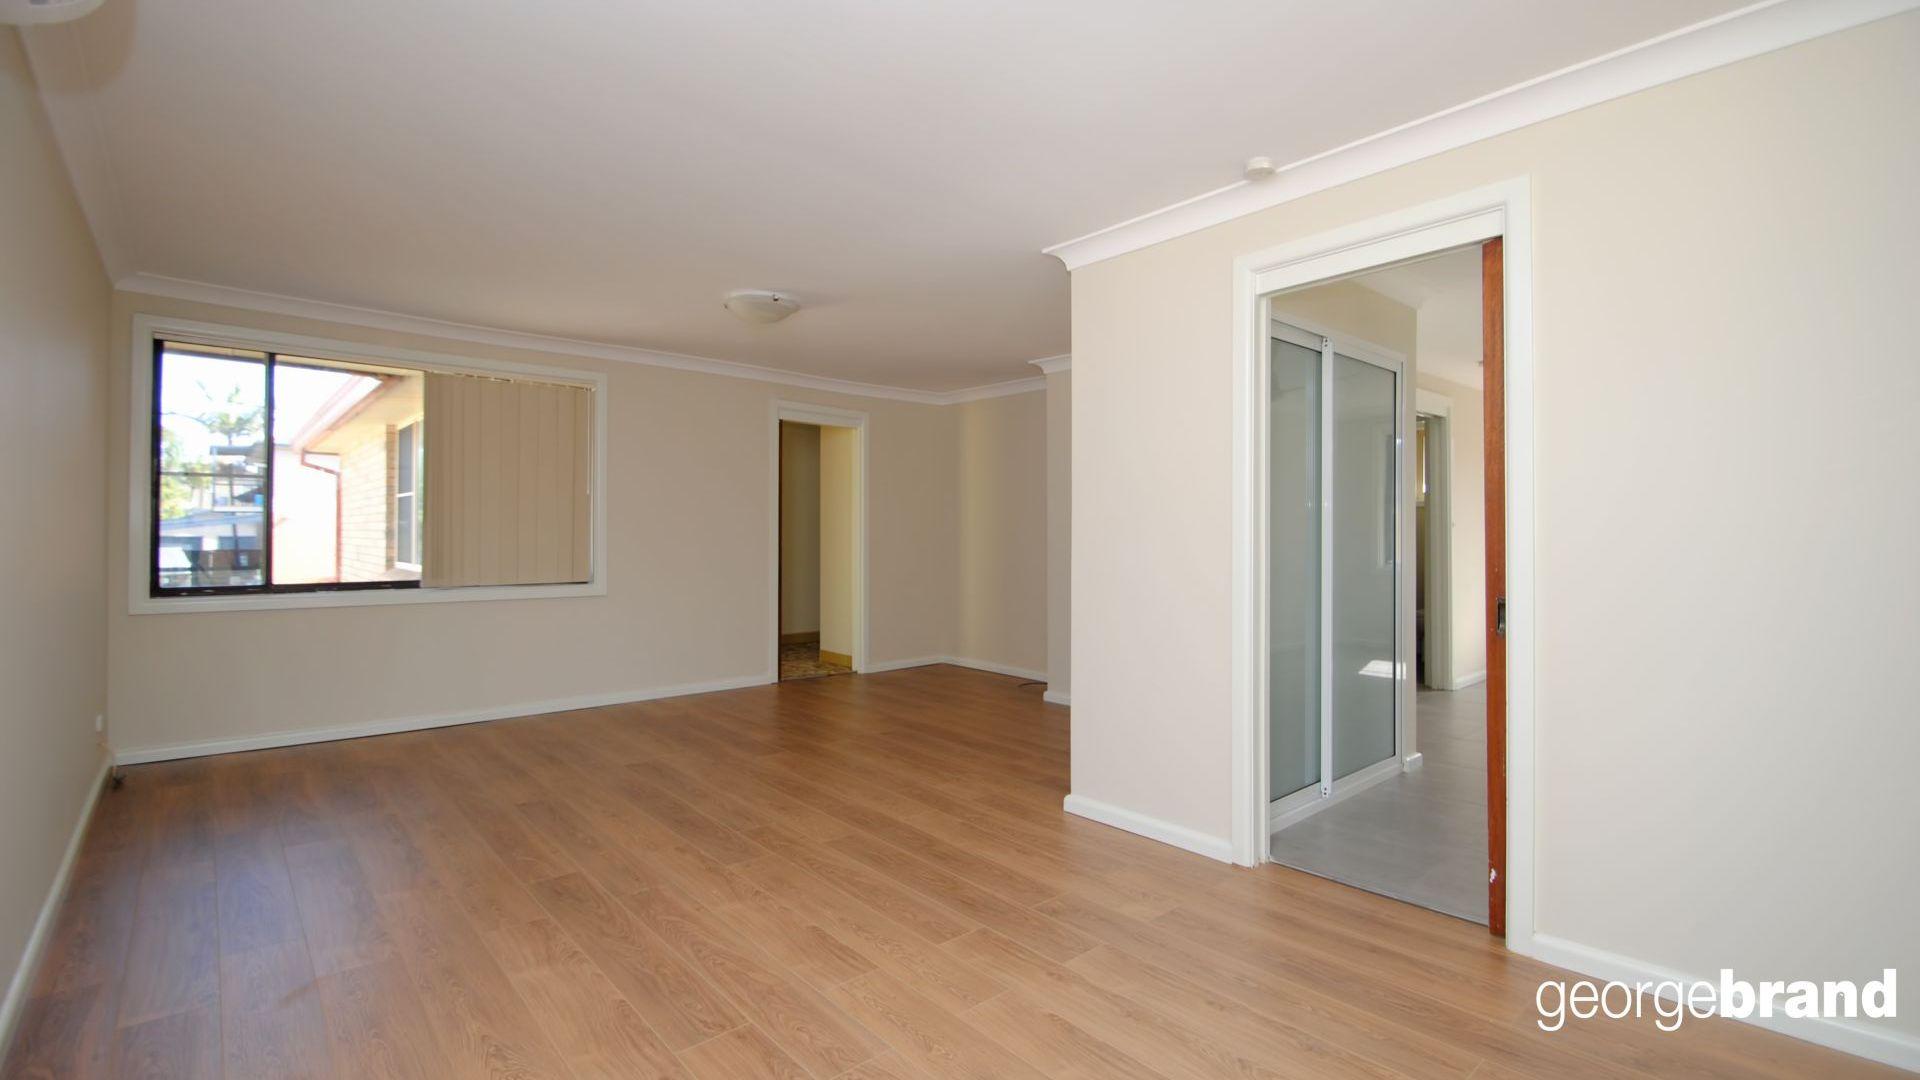 21 Shropshire Street, Gorokan NSW 2263, Image 2